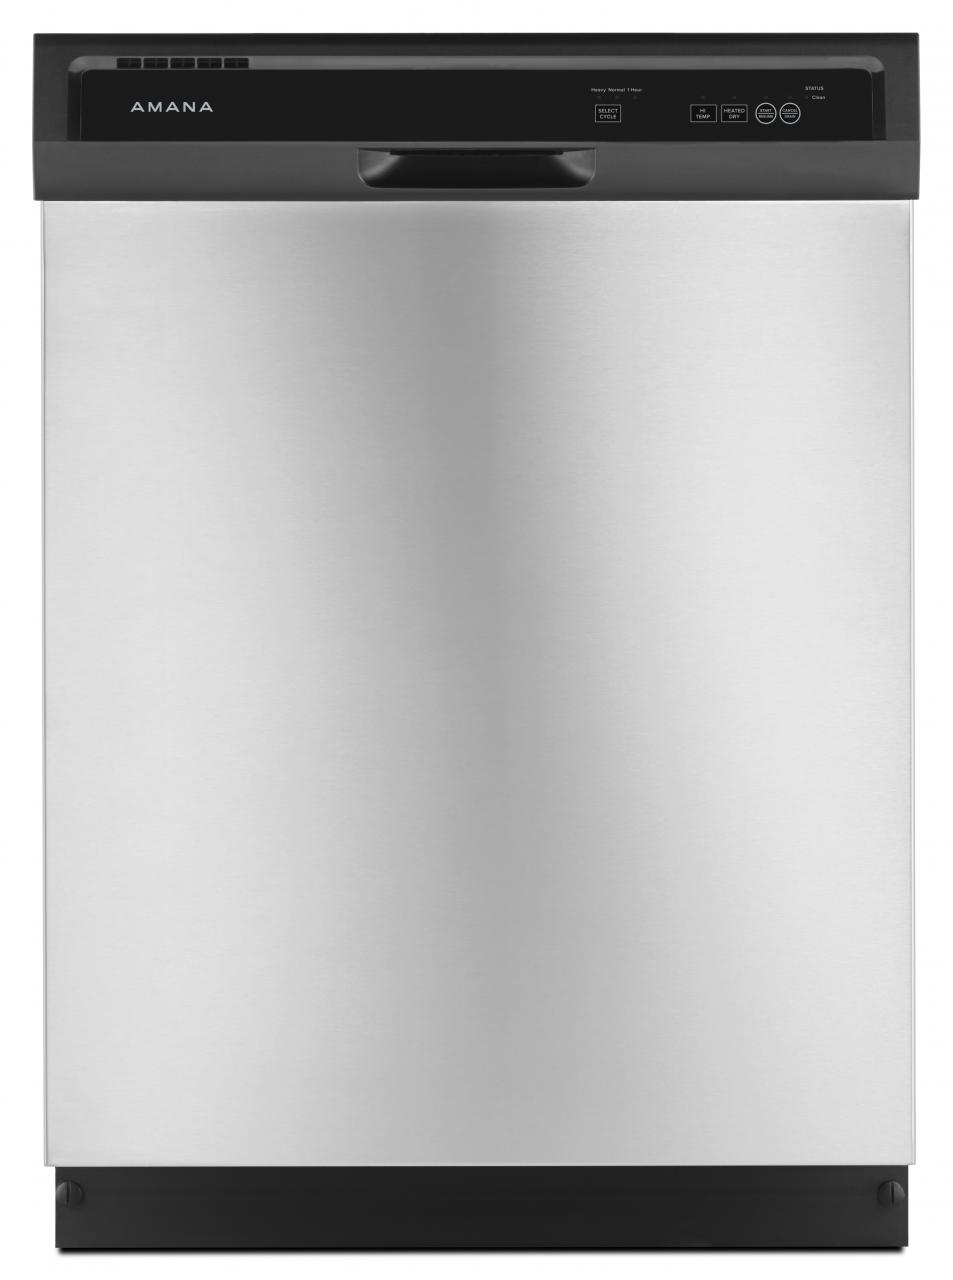 Kitchen Appliances Amp Appliance Service In Chippewa Falls